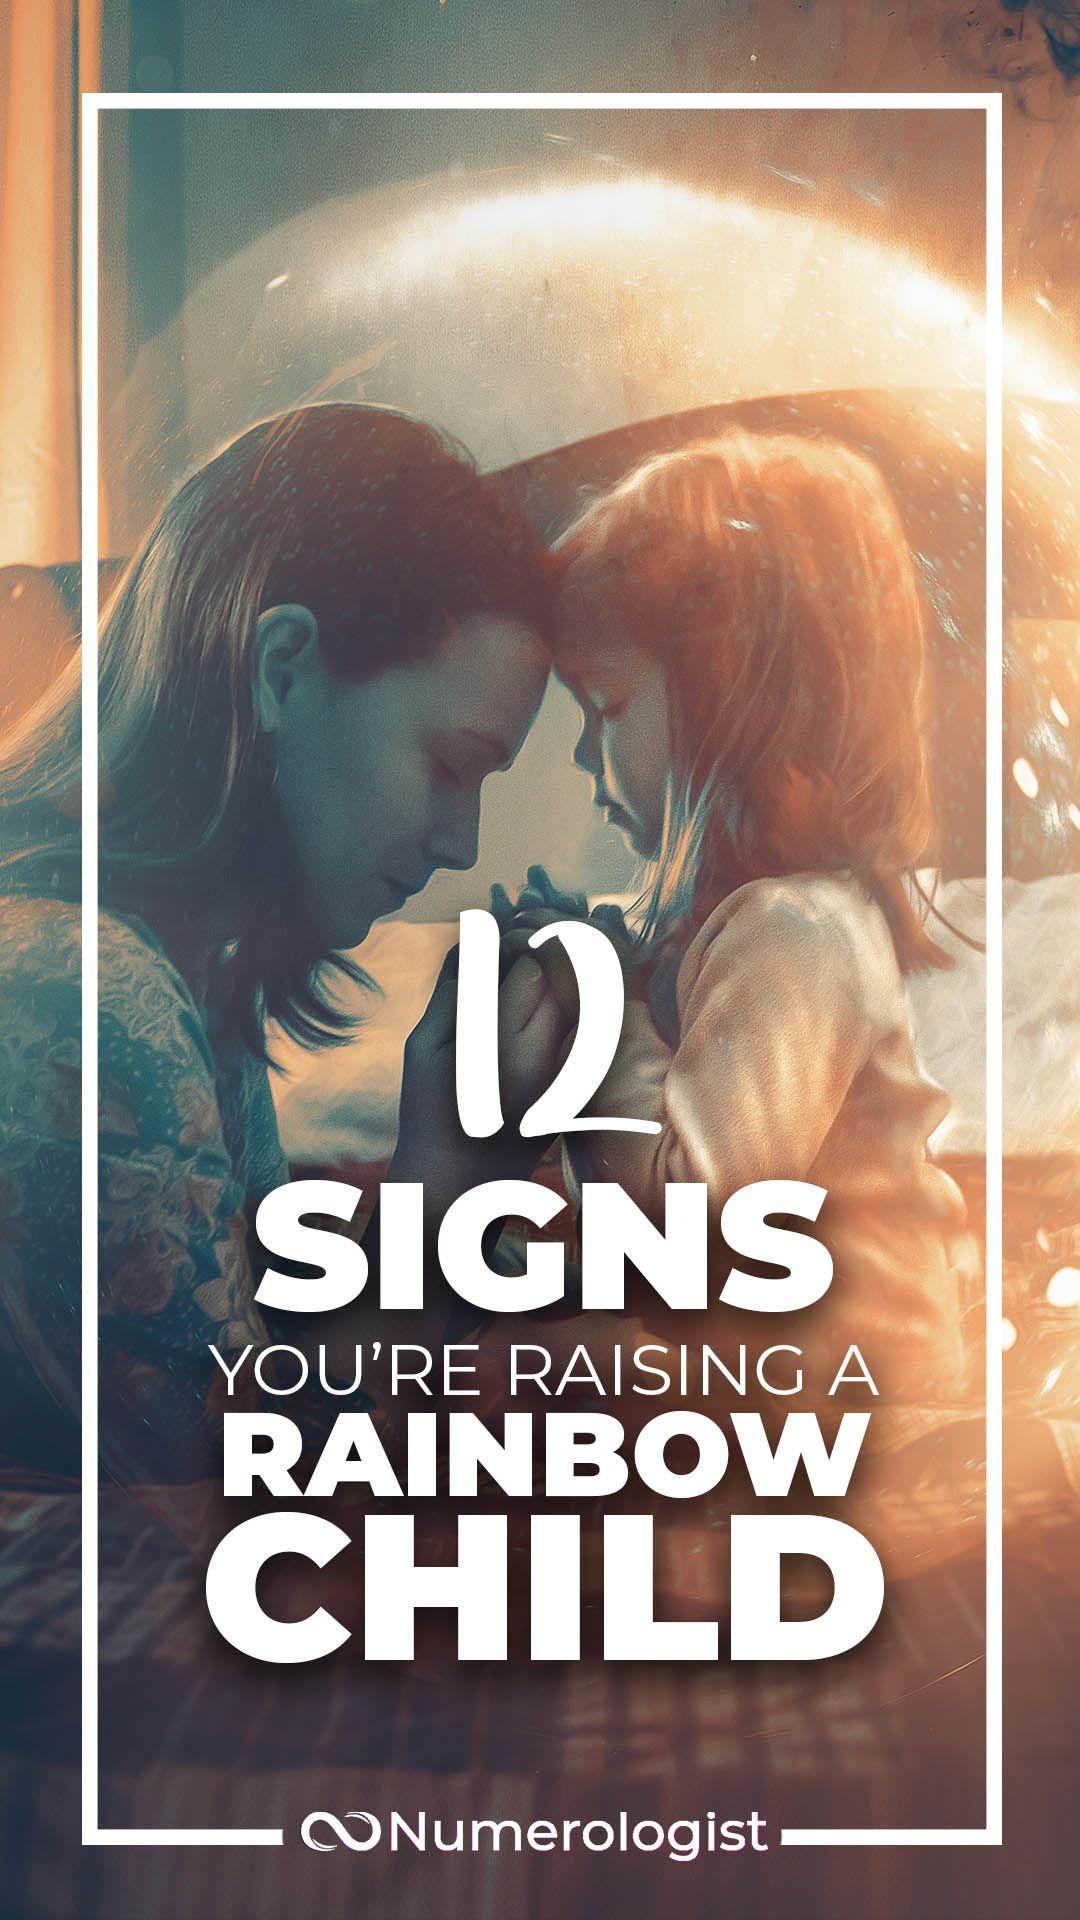 Rainbow Child: Are You Raising One?